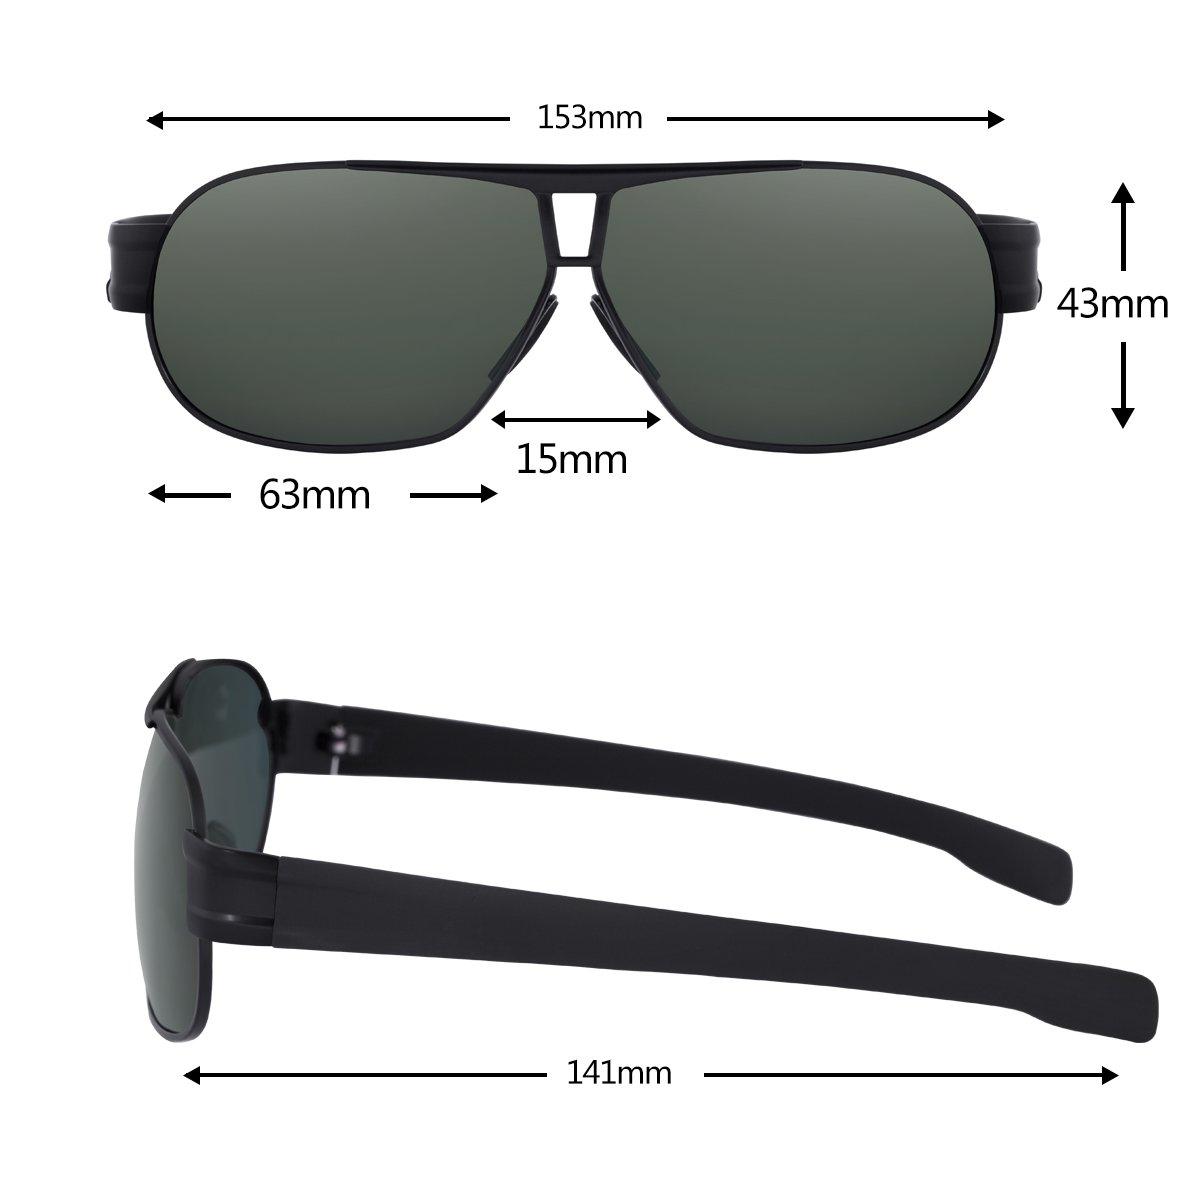 Zealme Polarized Aviator Sports Lightweight Durable Unbreakable Frame Anti Glare Baseball Cycling Fishing GolfRunning Bicycle Polaroid Hiking Sunglasses (Black) 8516